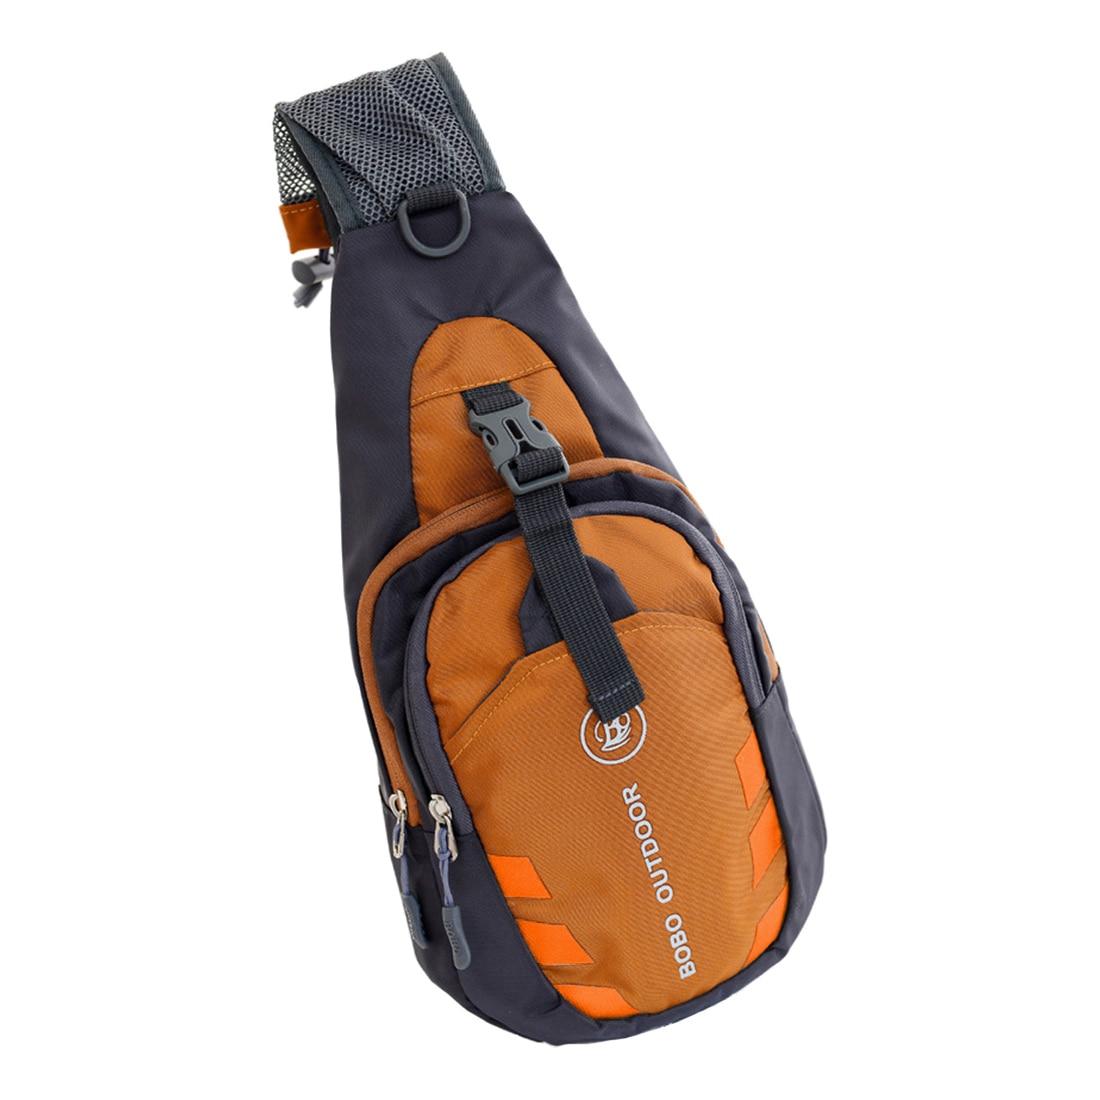 FGGS Mens Underarm Anti-Theft Holster Cross-Body Shoulder Fashion Travel Bag Yellow